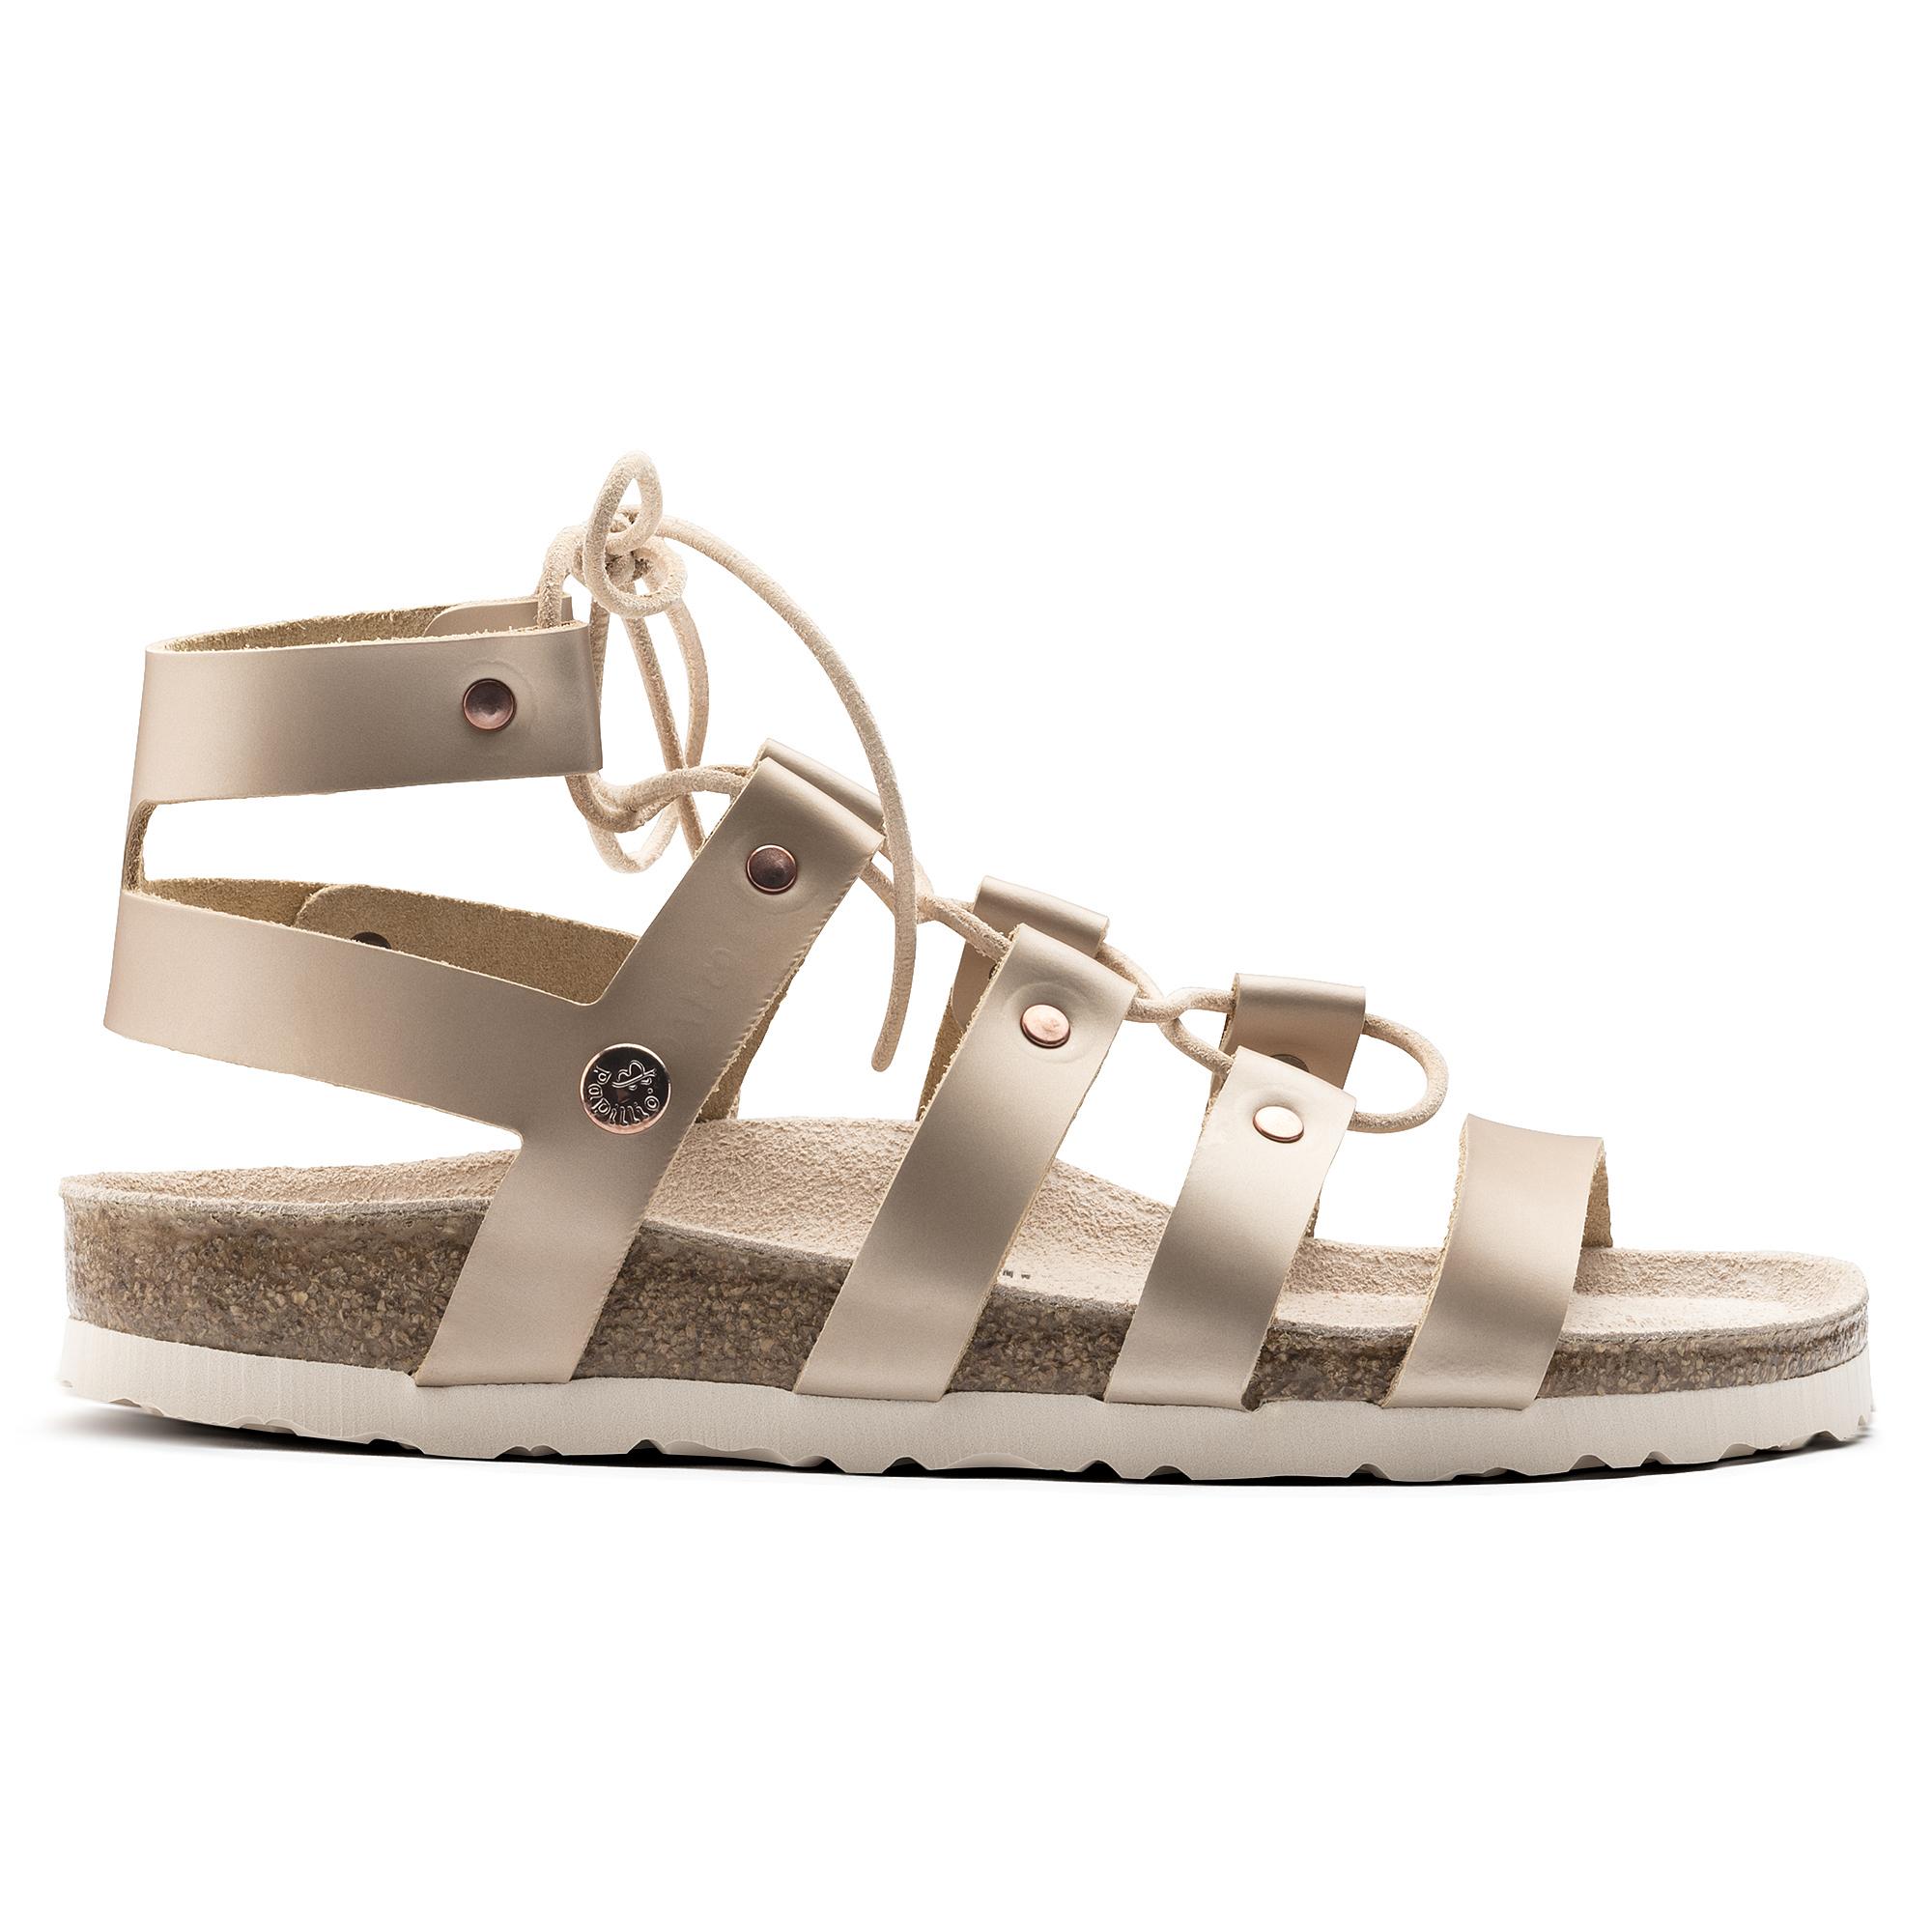 Sandales Birkenstock Sandales Cleo En W Silver mRsGc0